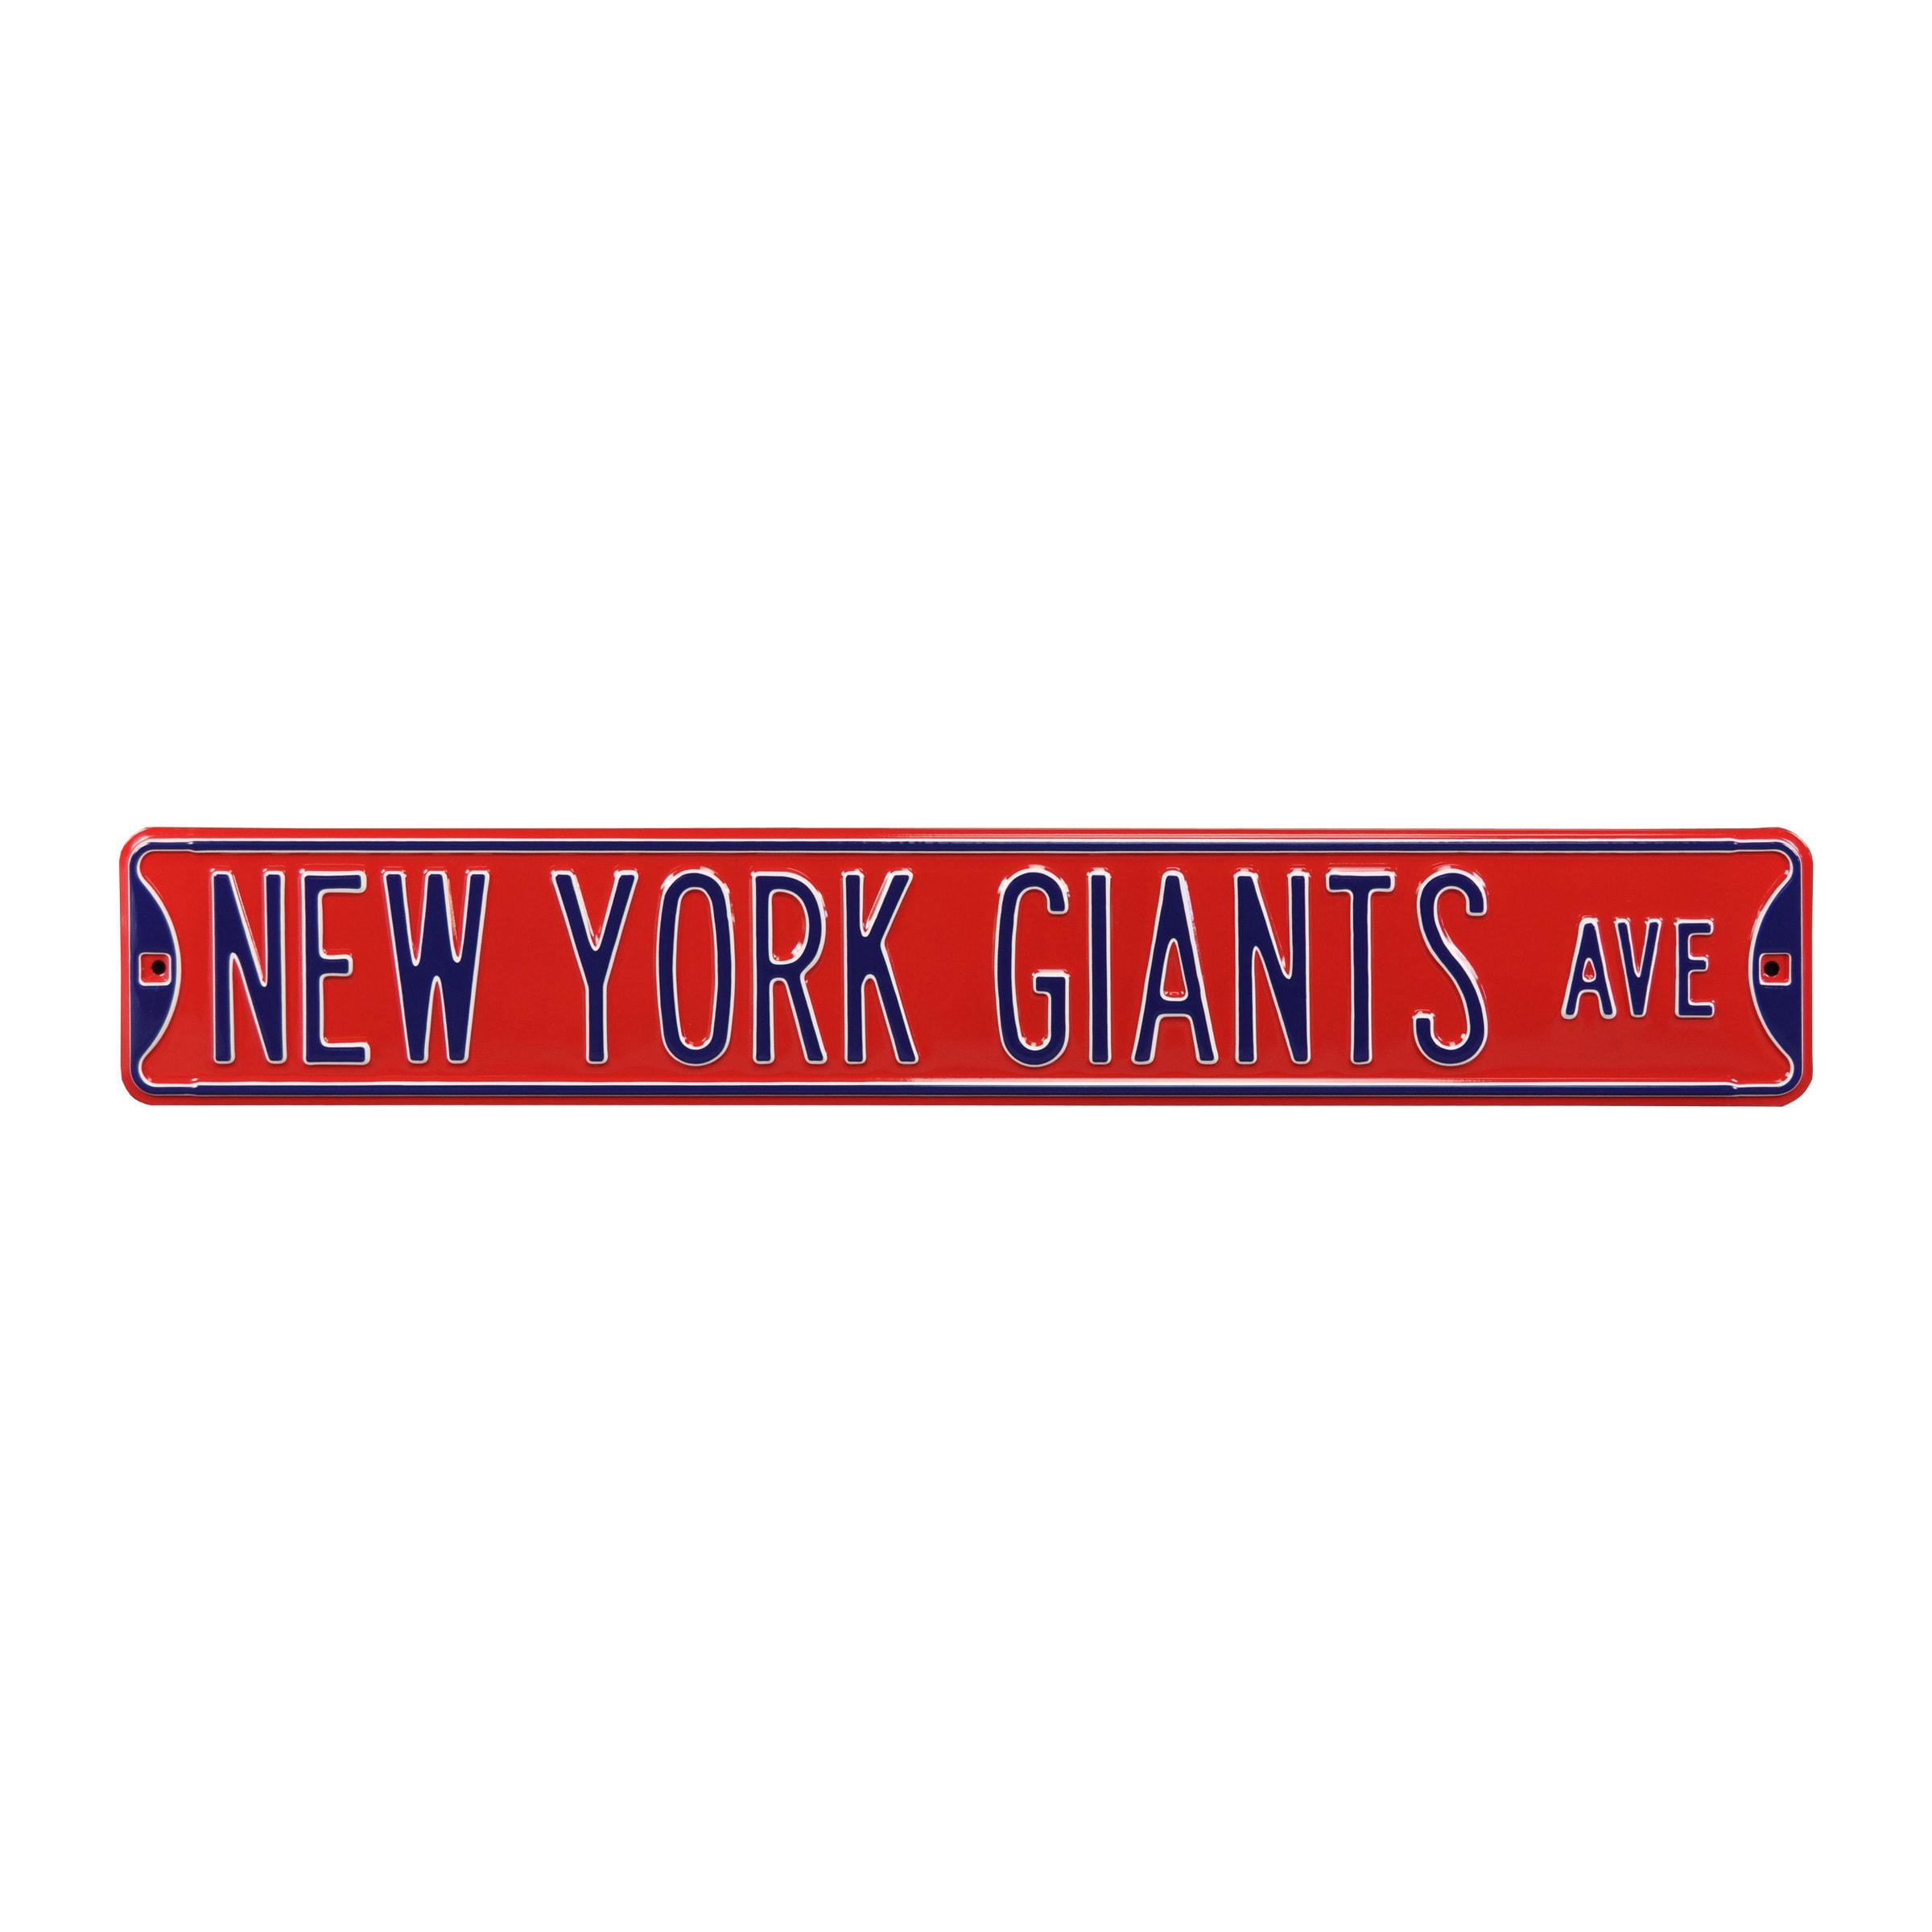 "New York Giants 6"" x 36"" Steel Street Sign - Red"